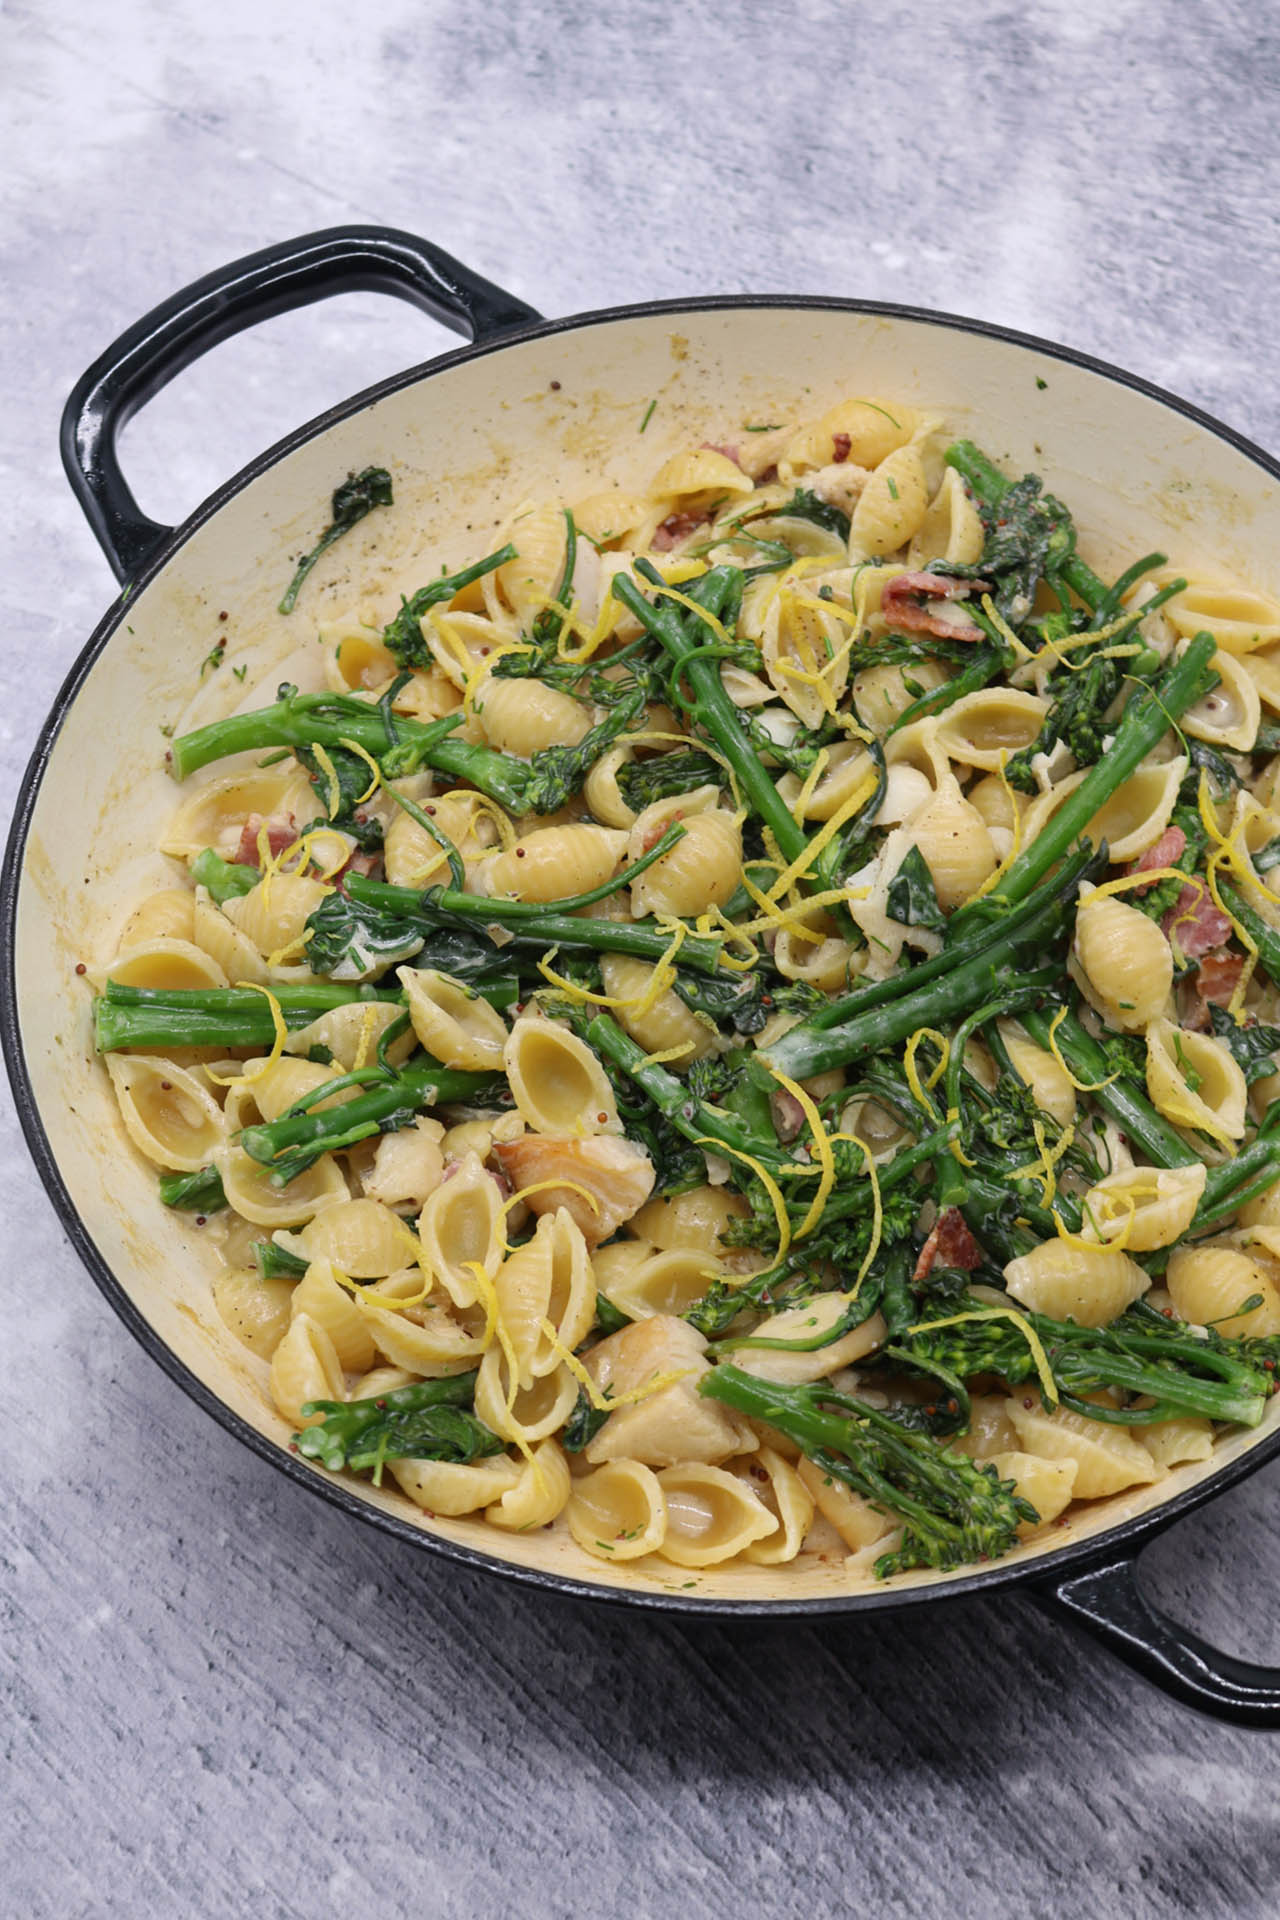 Smoked Haddock with Tenderstem Broccoli, Spinach and Conchiglie, Smoked Haddock with Tenderstem Broccoli, Spinach and Conchiglie